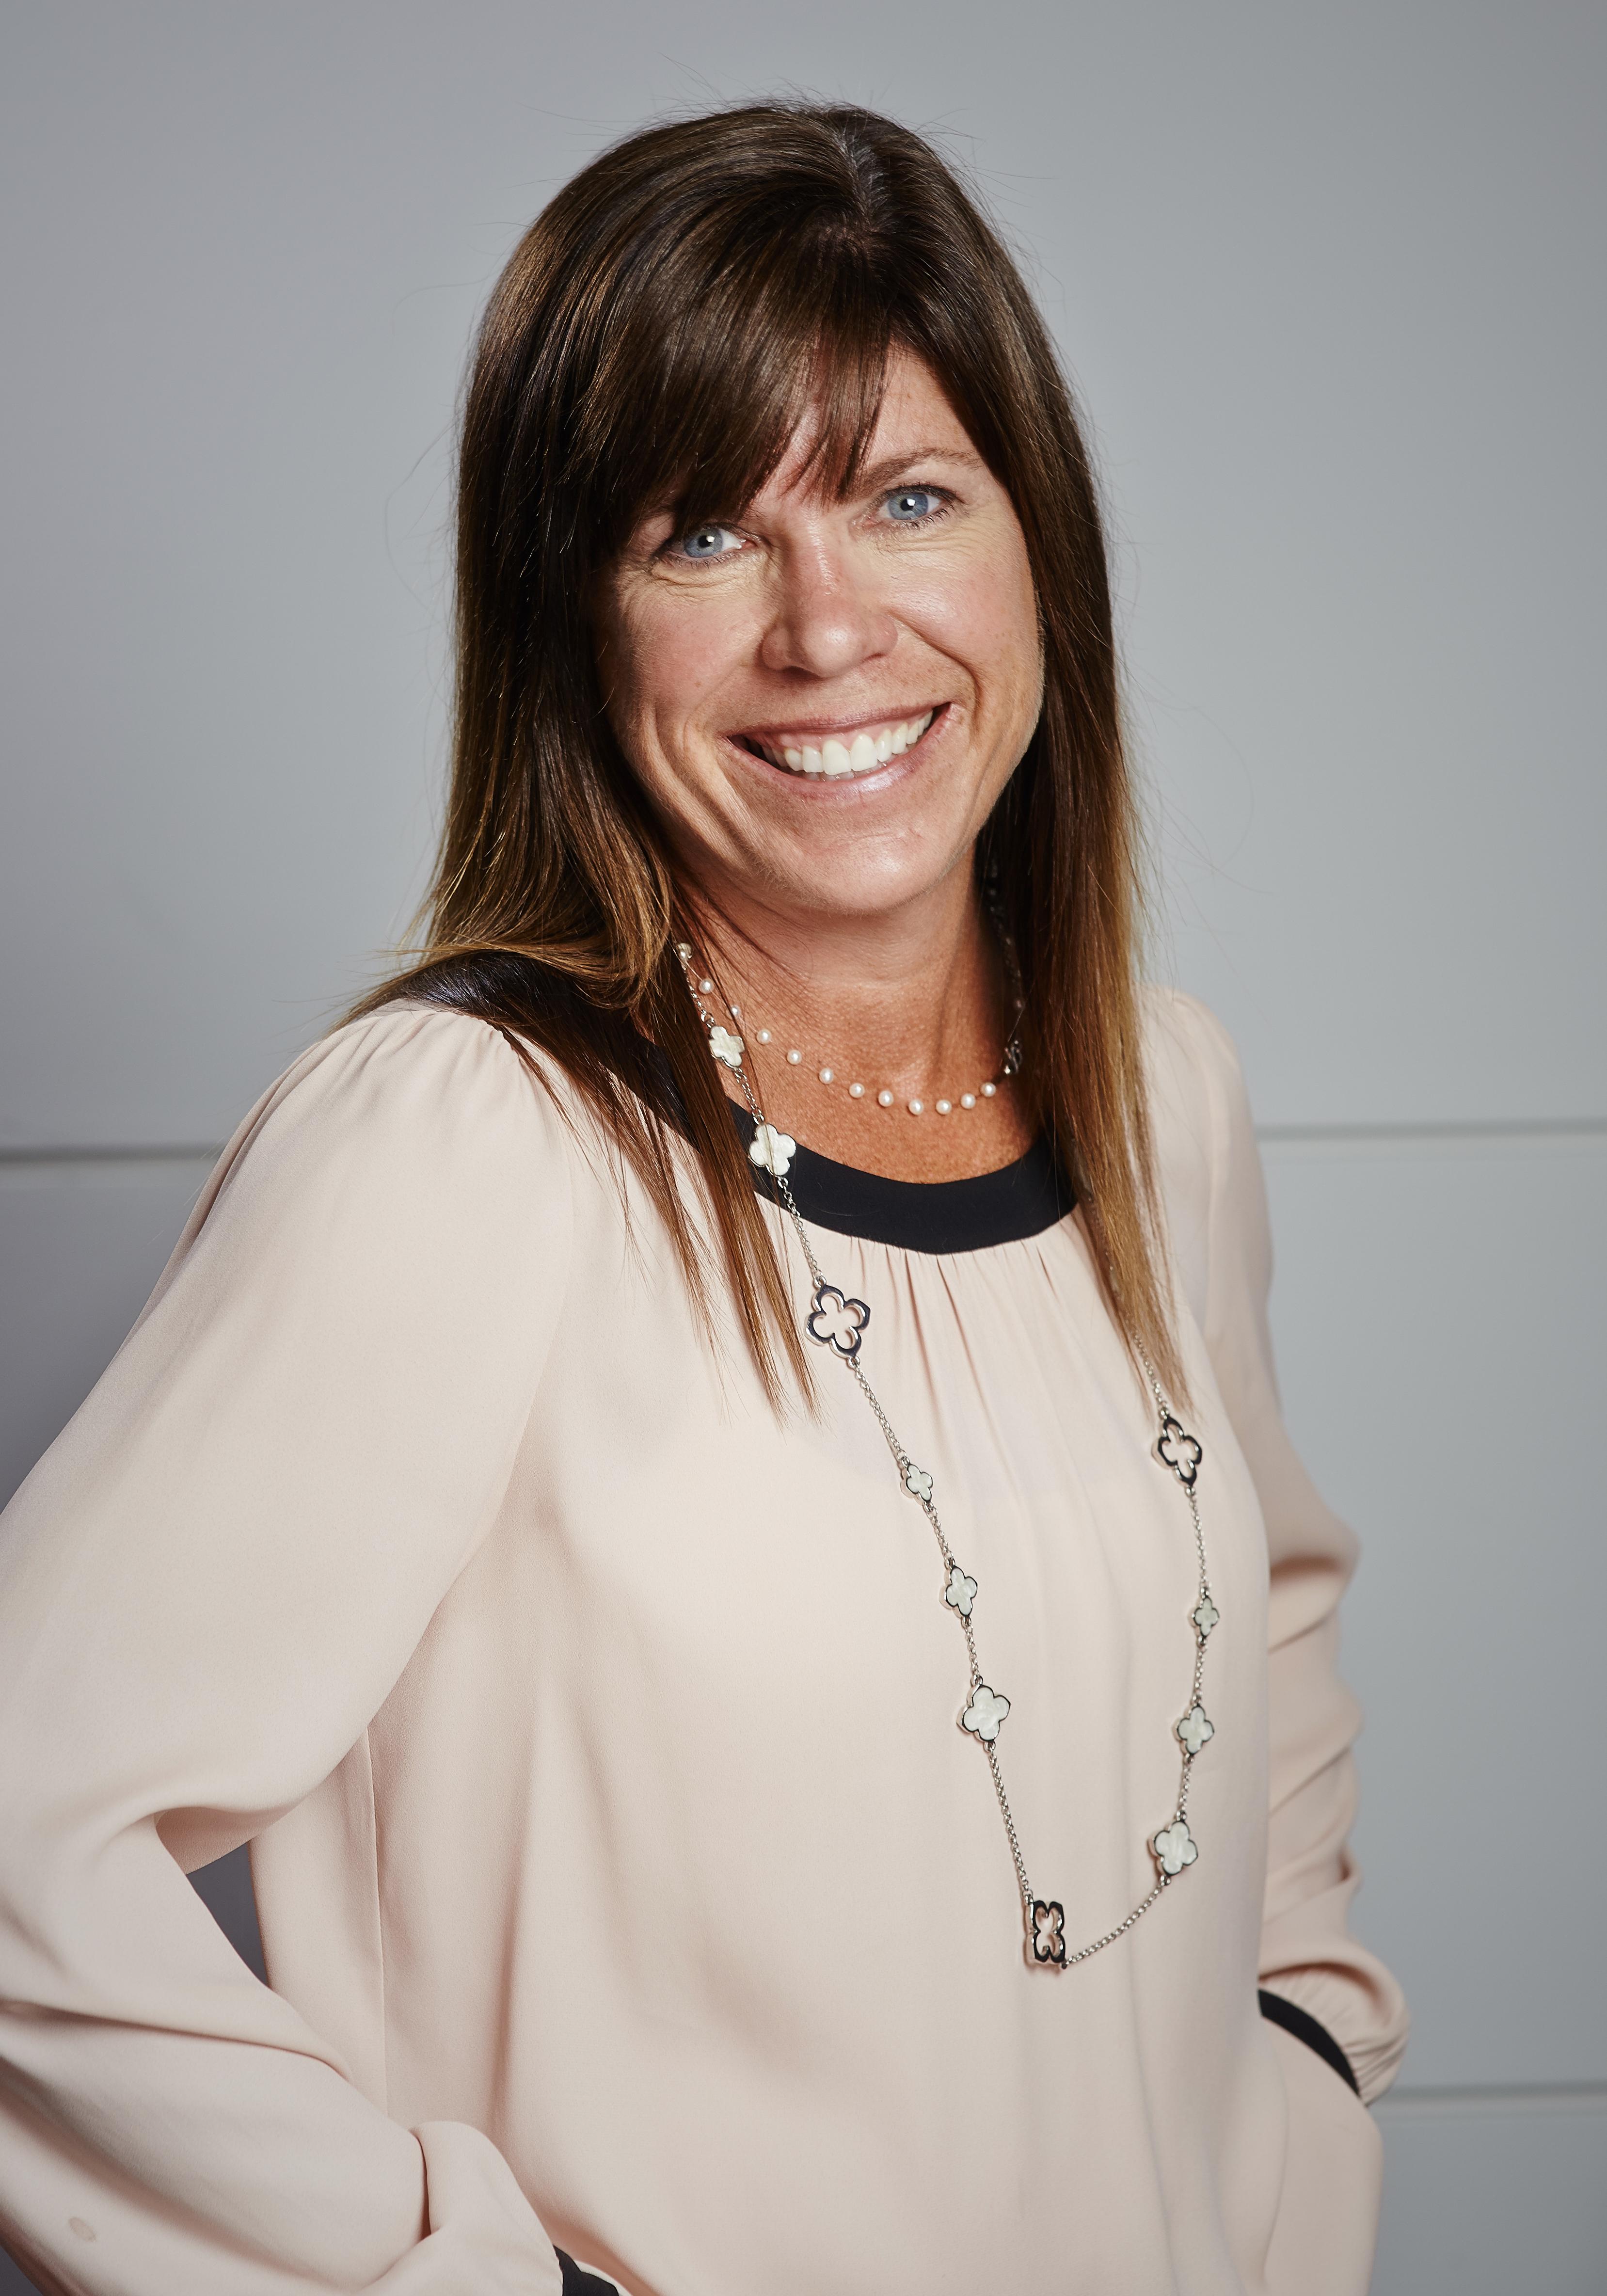 Mollie Spilman, chief revenue officer at Criteo